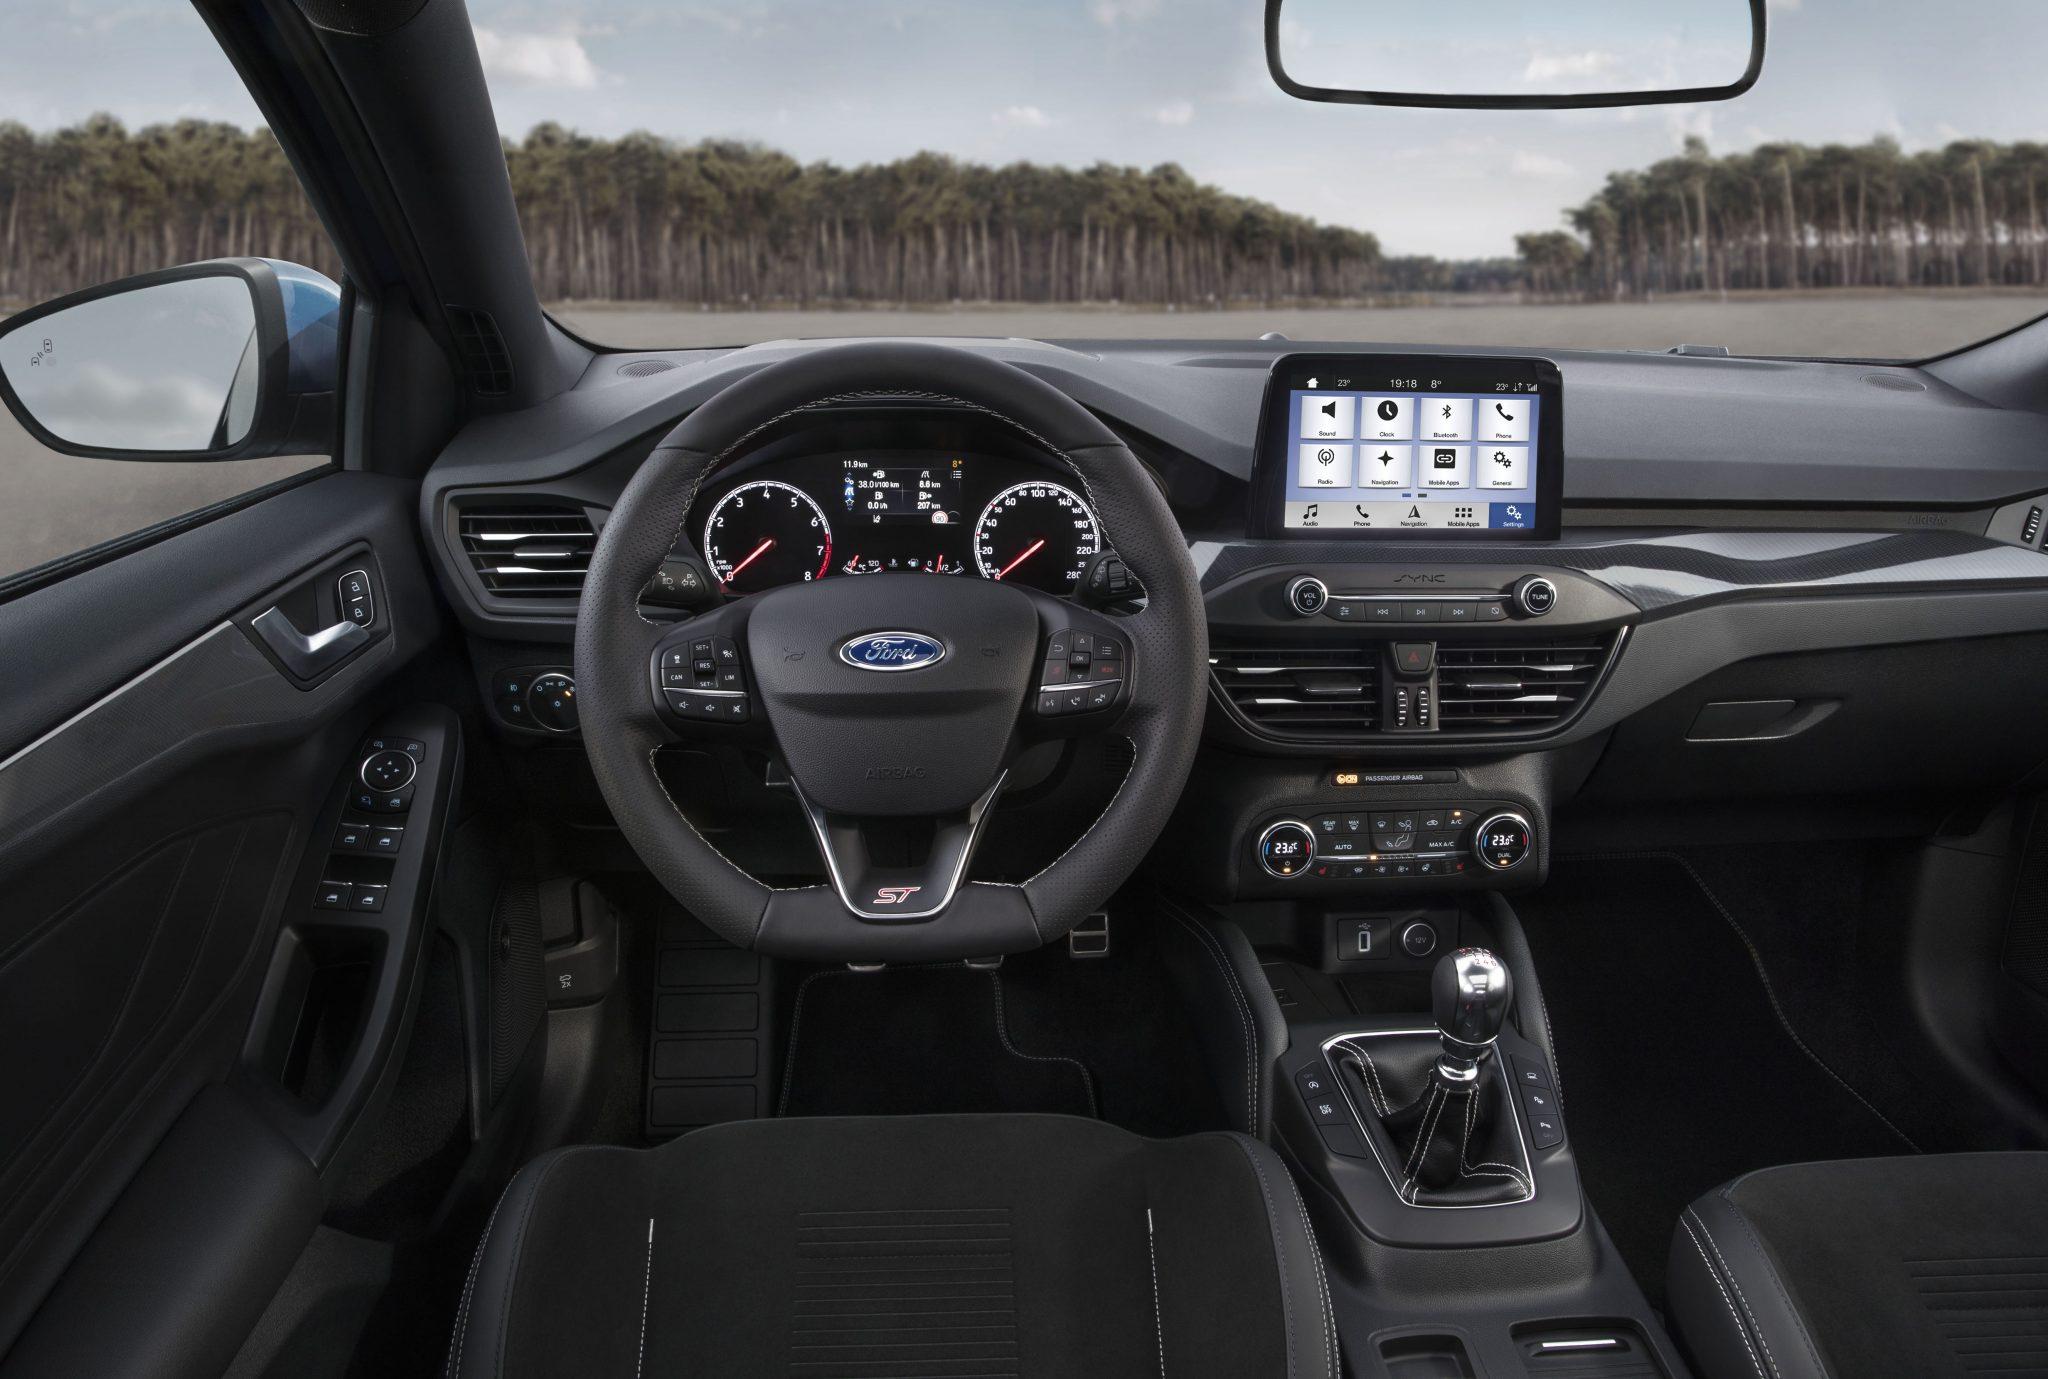 Ford Focus ST interieur